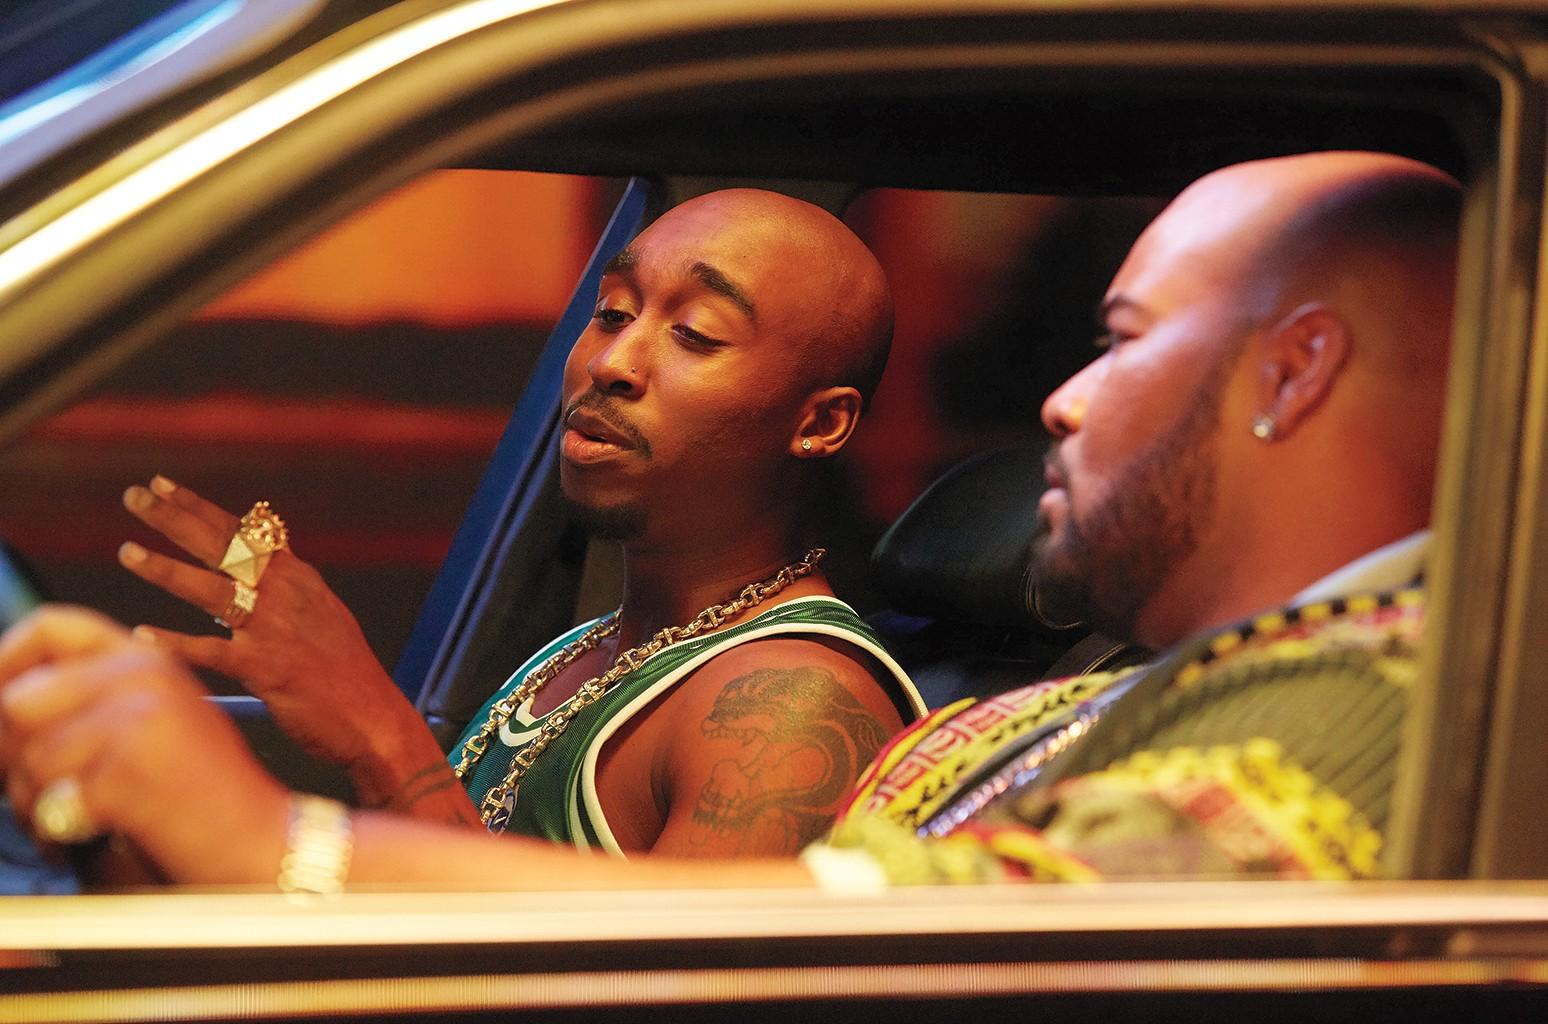 Film still from Tupac Shakur's biopic, 'All Eyez on Me'